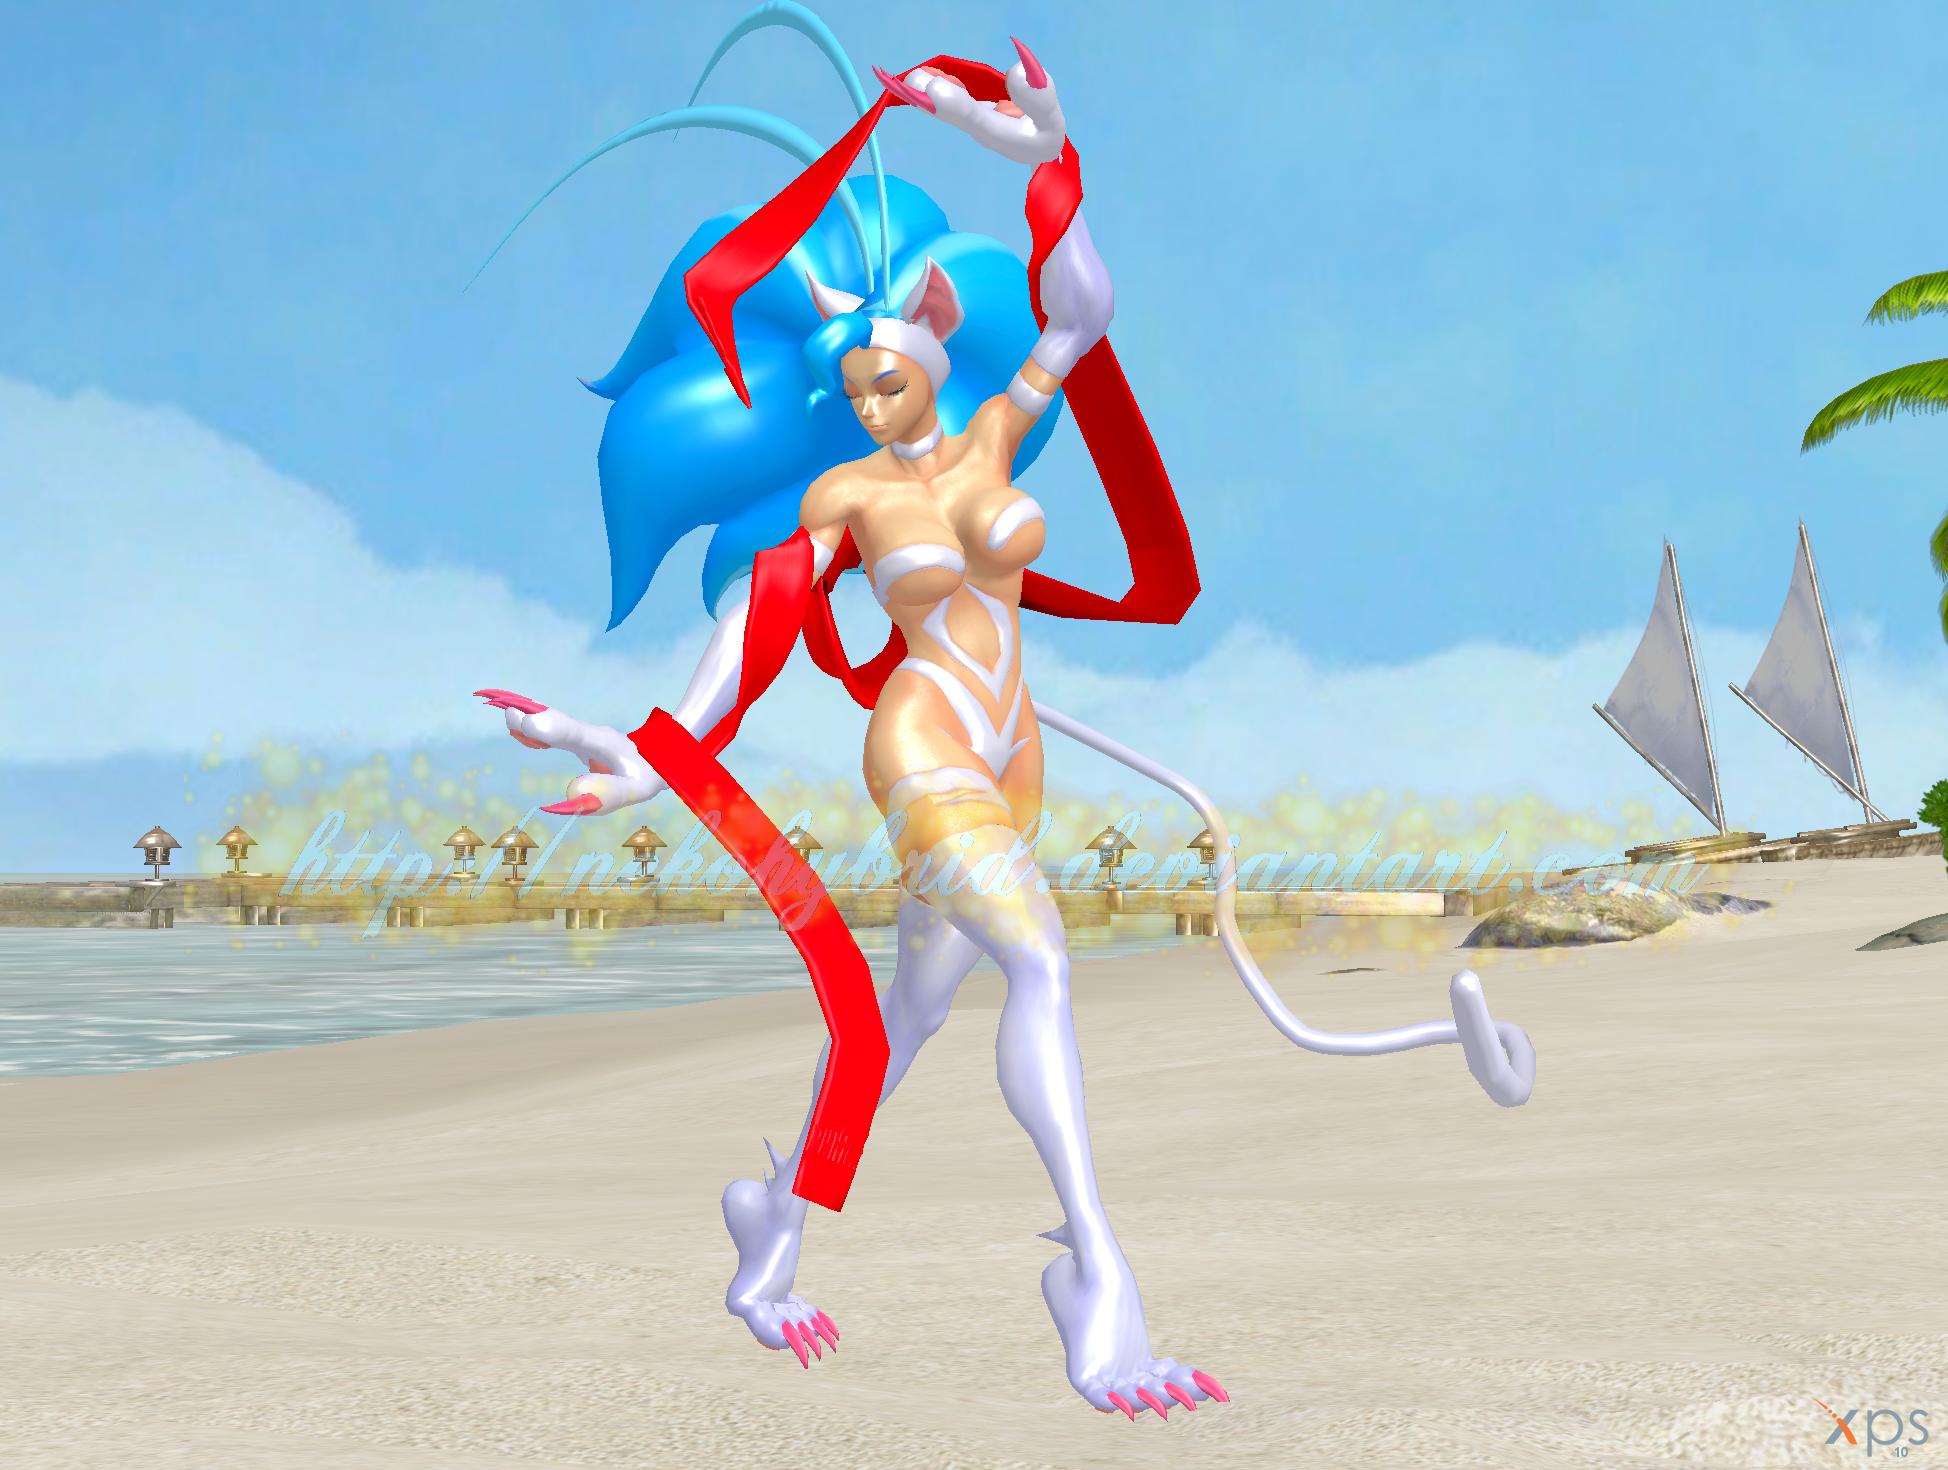 Felicia the Silk Dancer by NekoHybrid